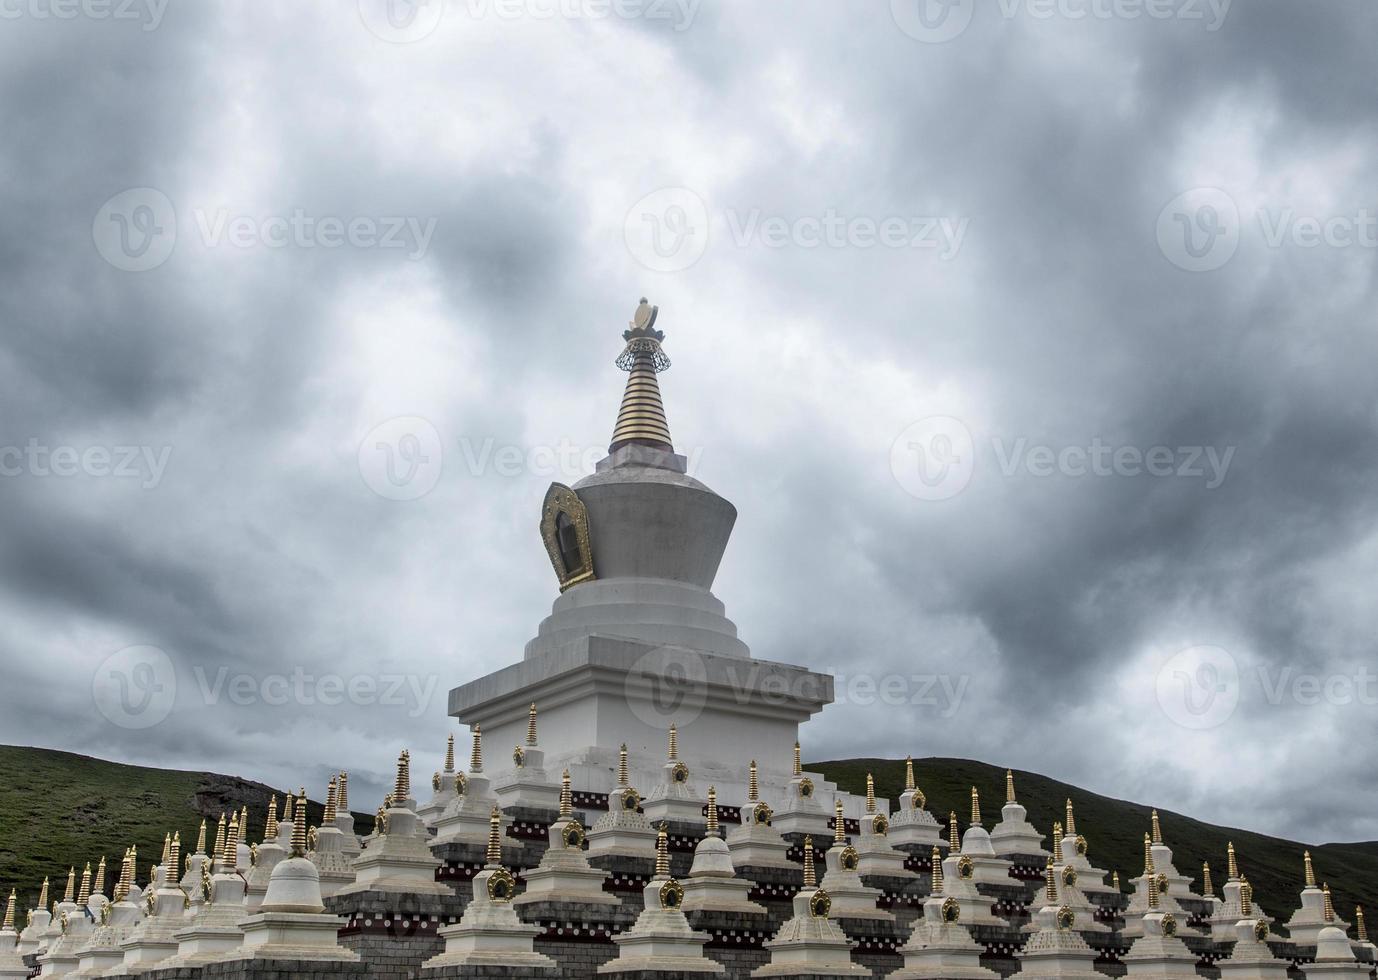 templo sagrado de Buda no Tibete e china tradicional foto